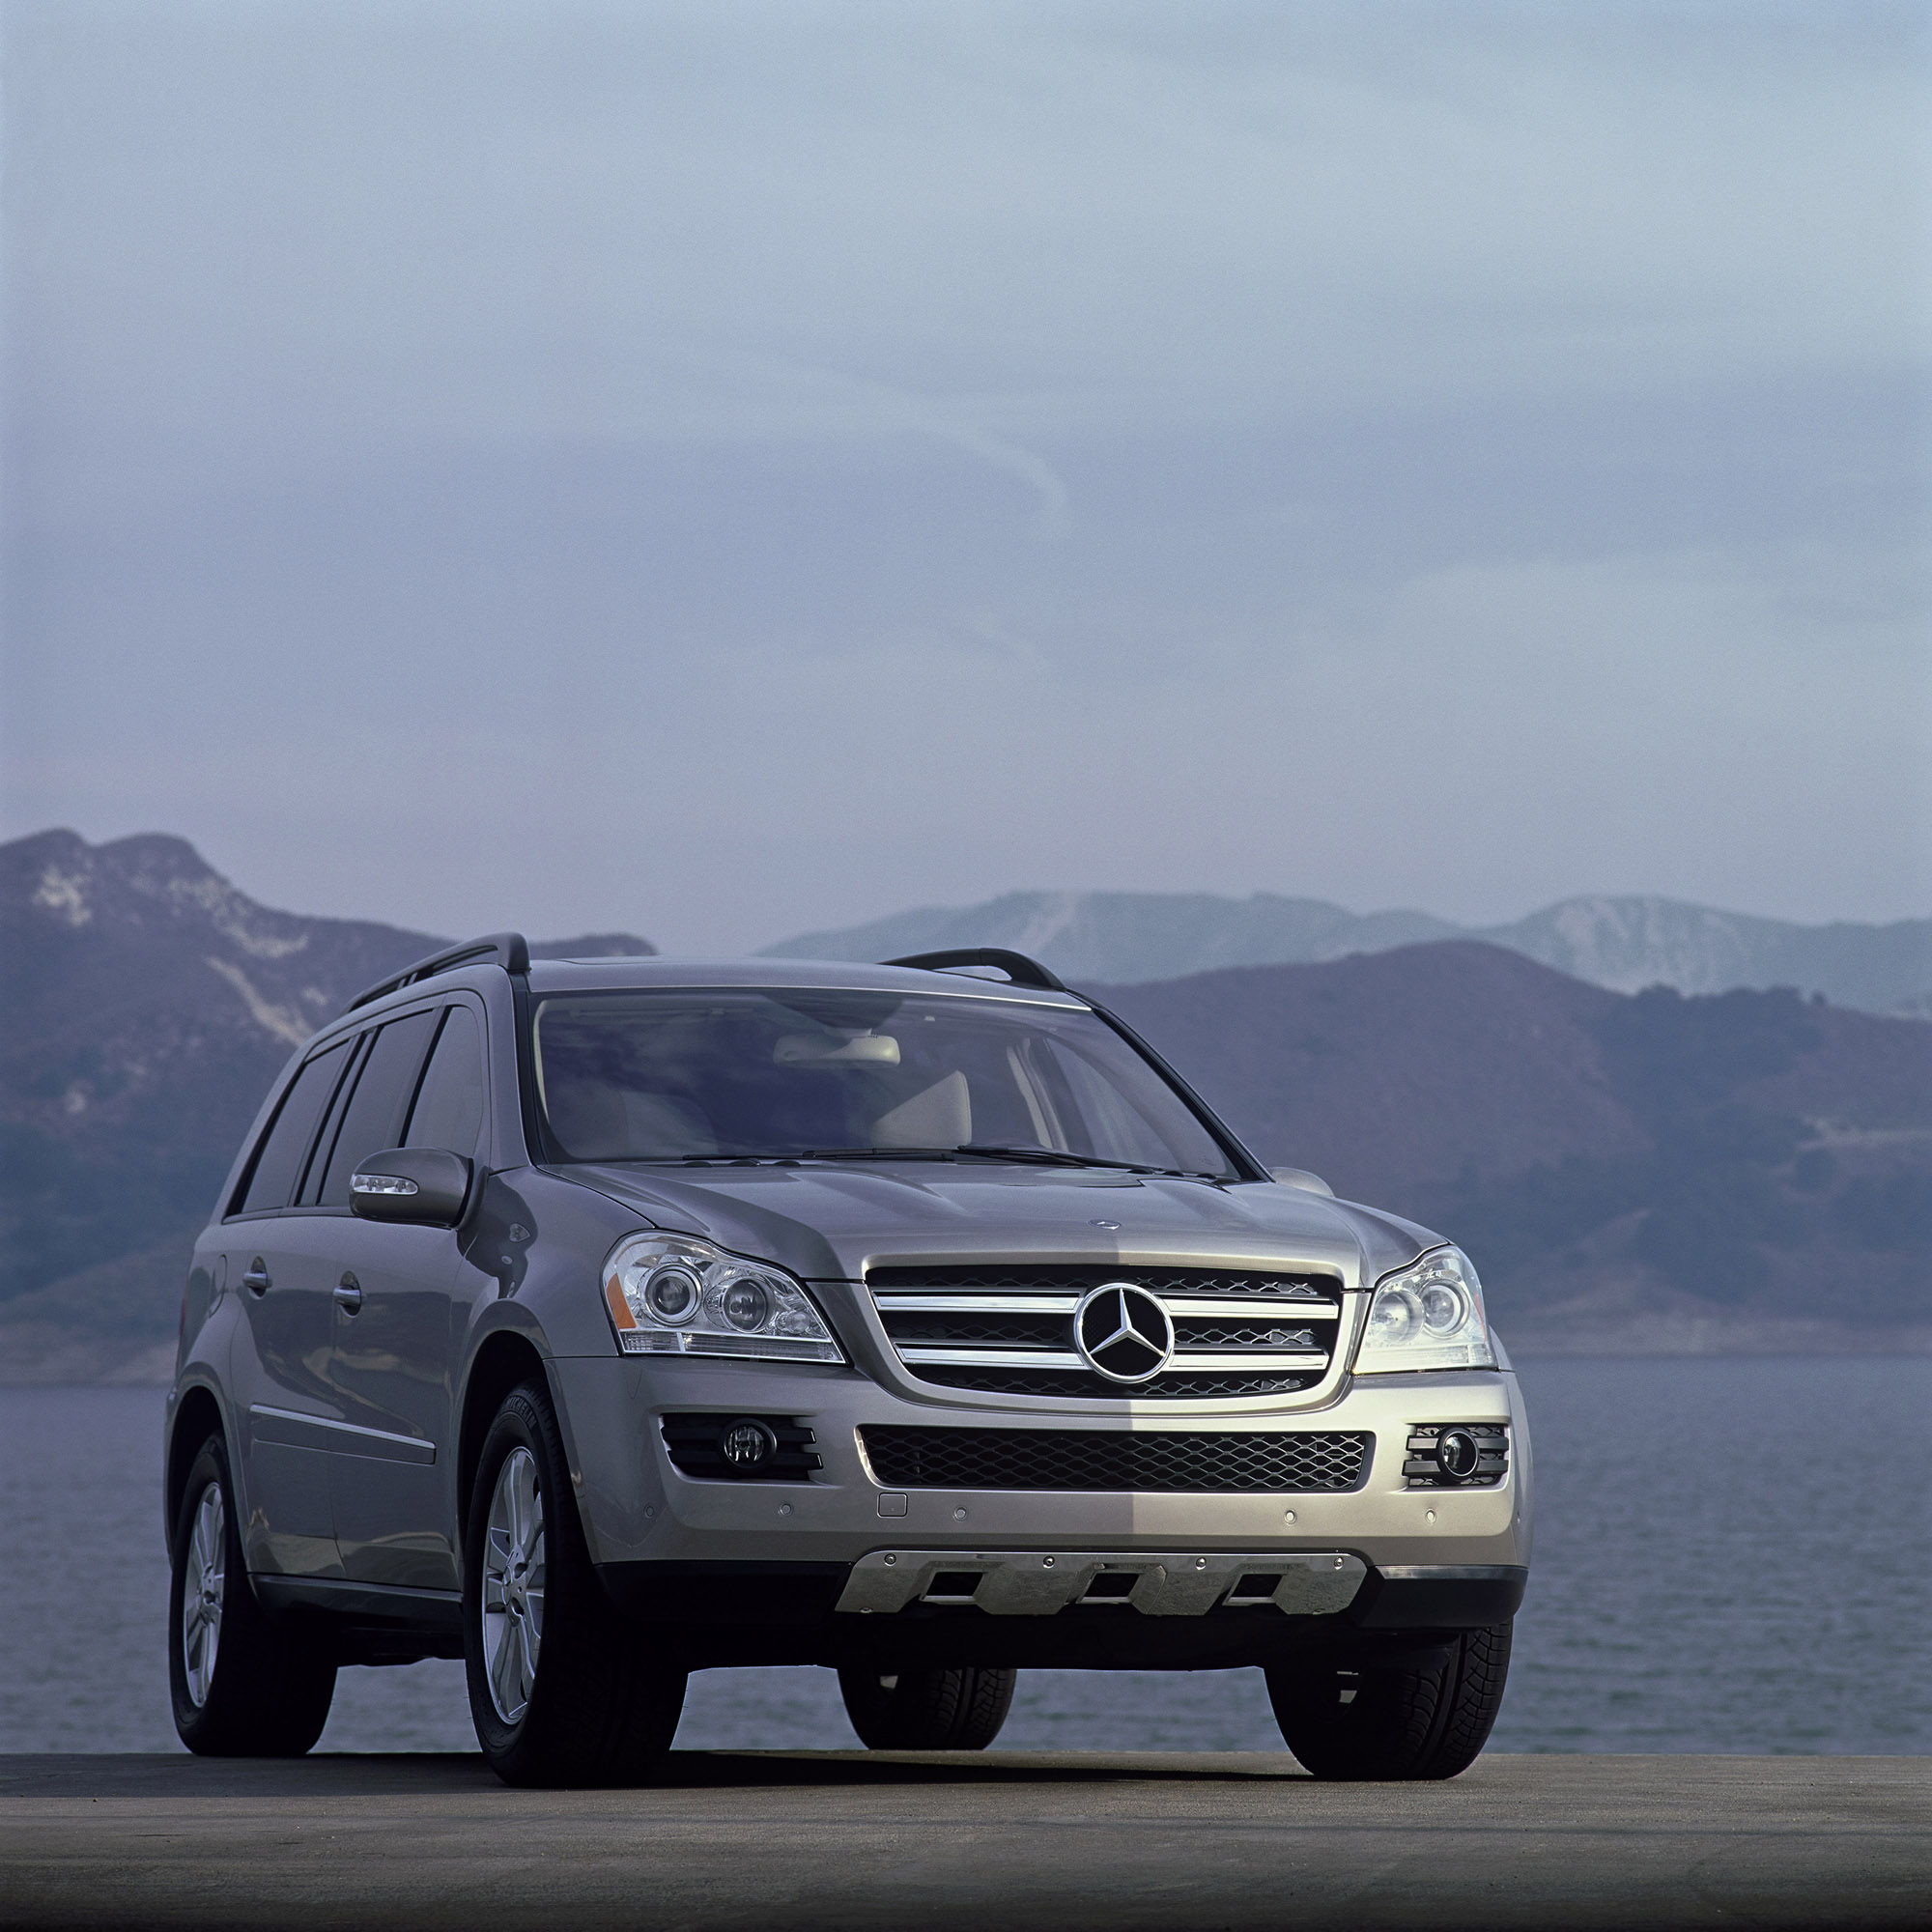 2012 Mercedes Benz Gl Class Camshaft: 2012 Volkswagen CrossPolo Urban White